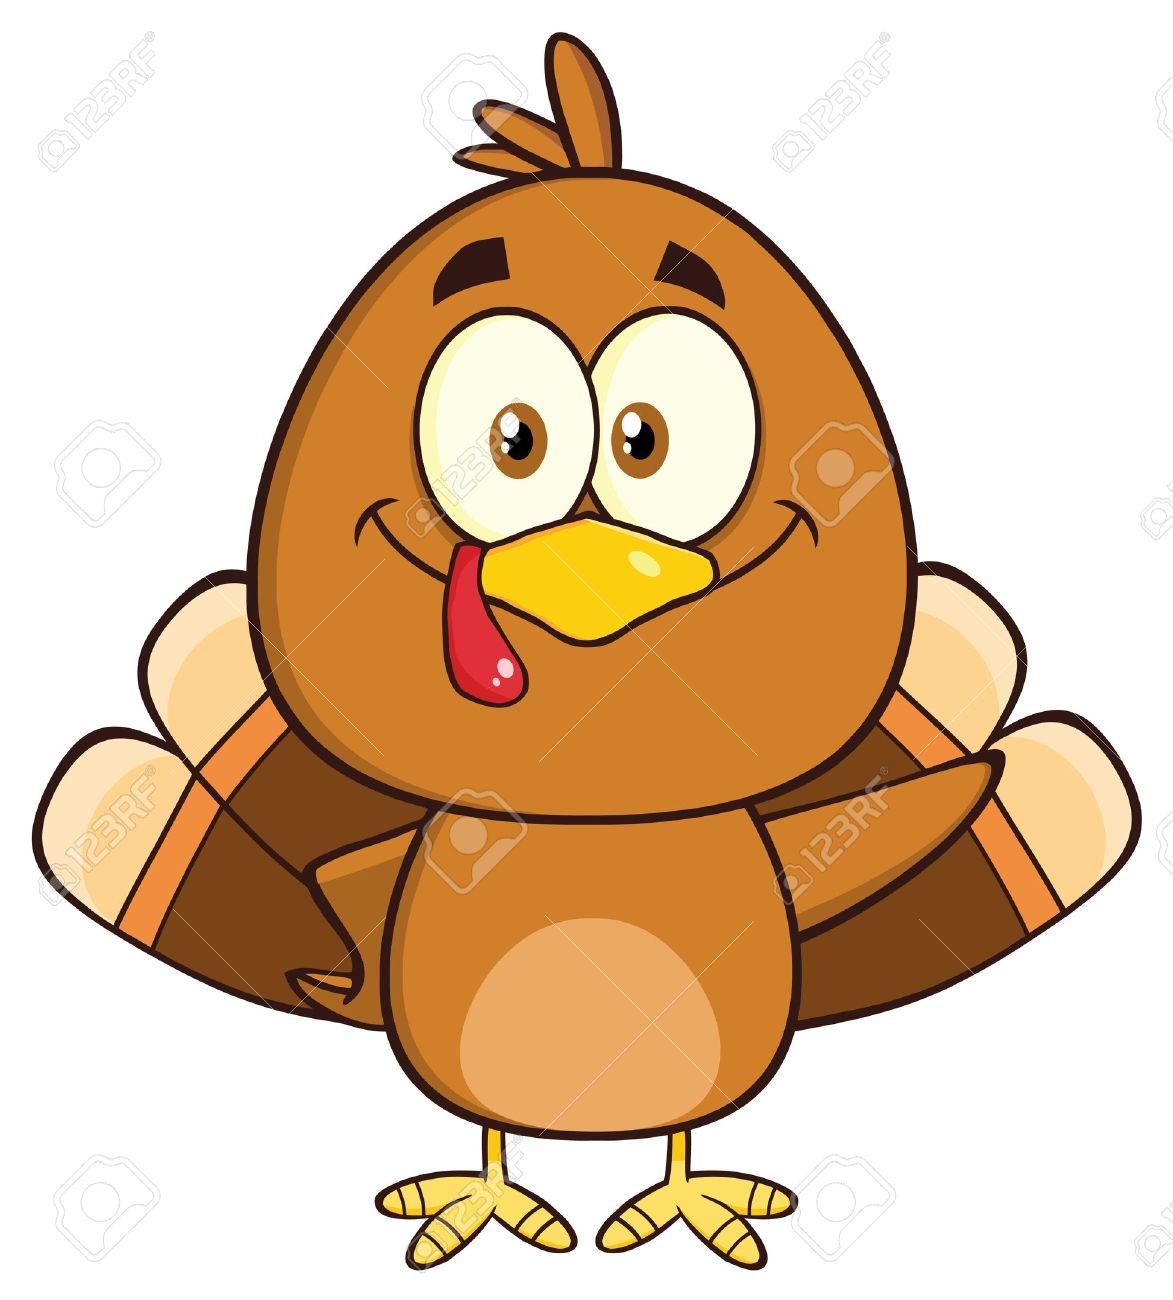 Cute Turkey Clipart Free Download Best Cute Turkey Clipart On